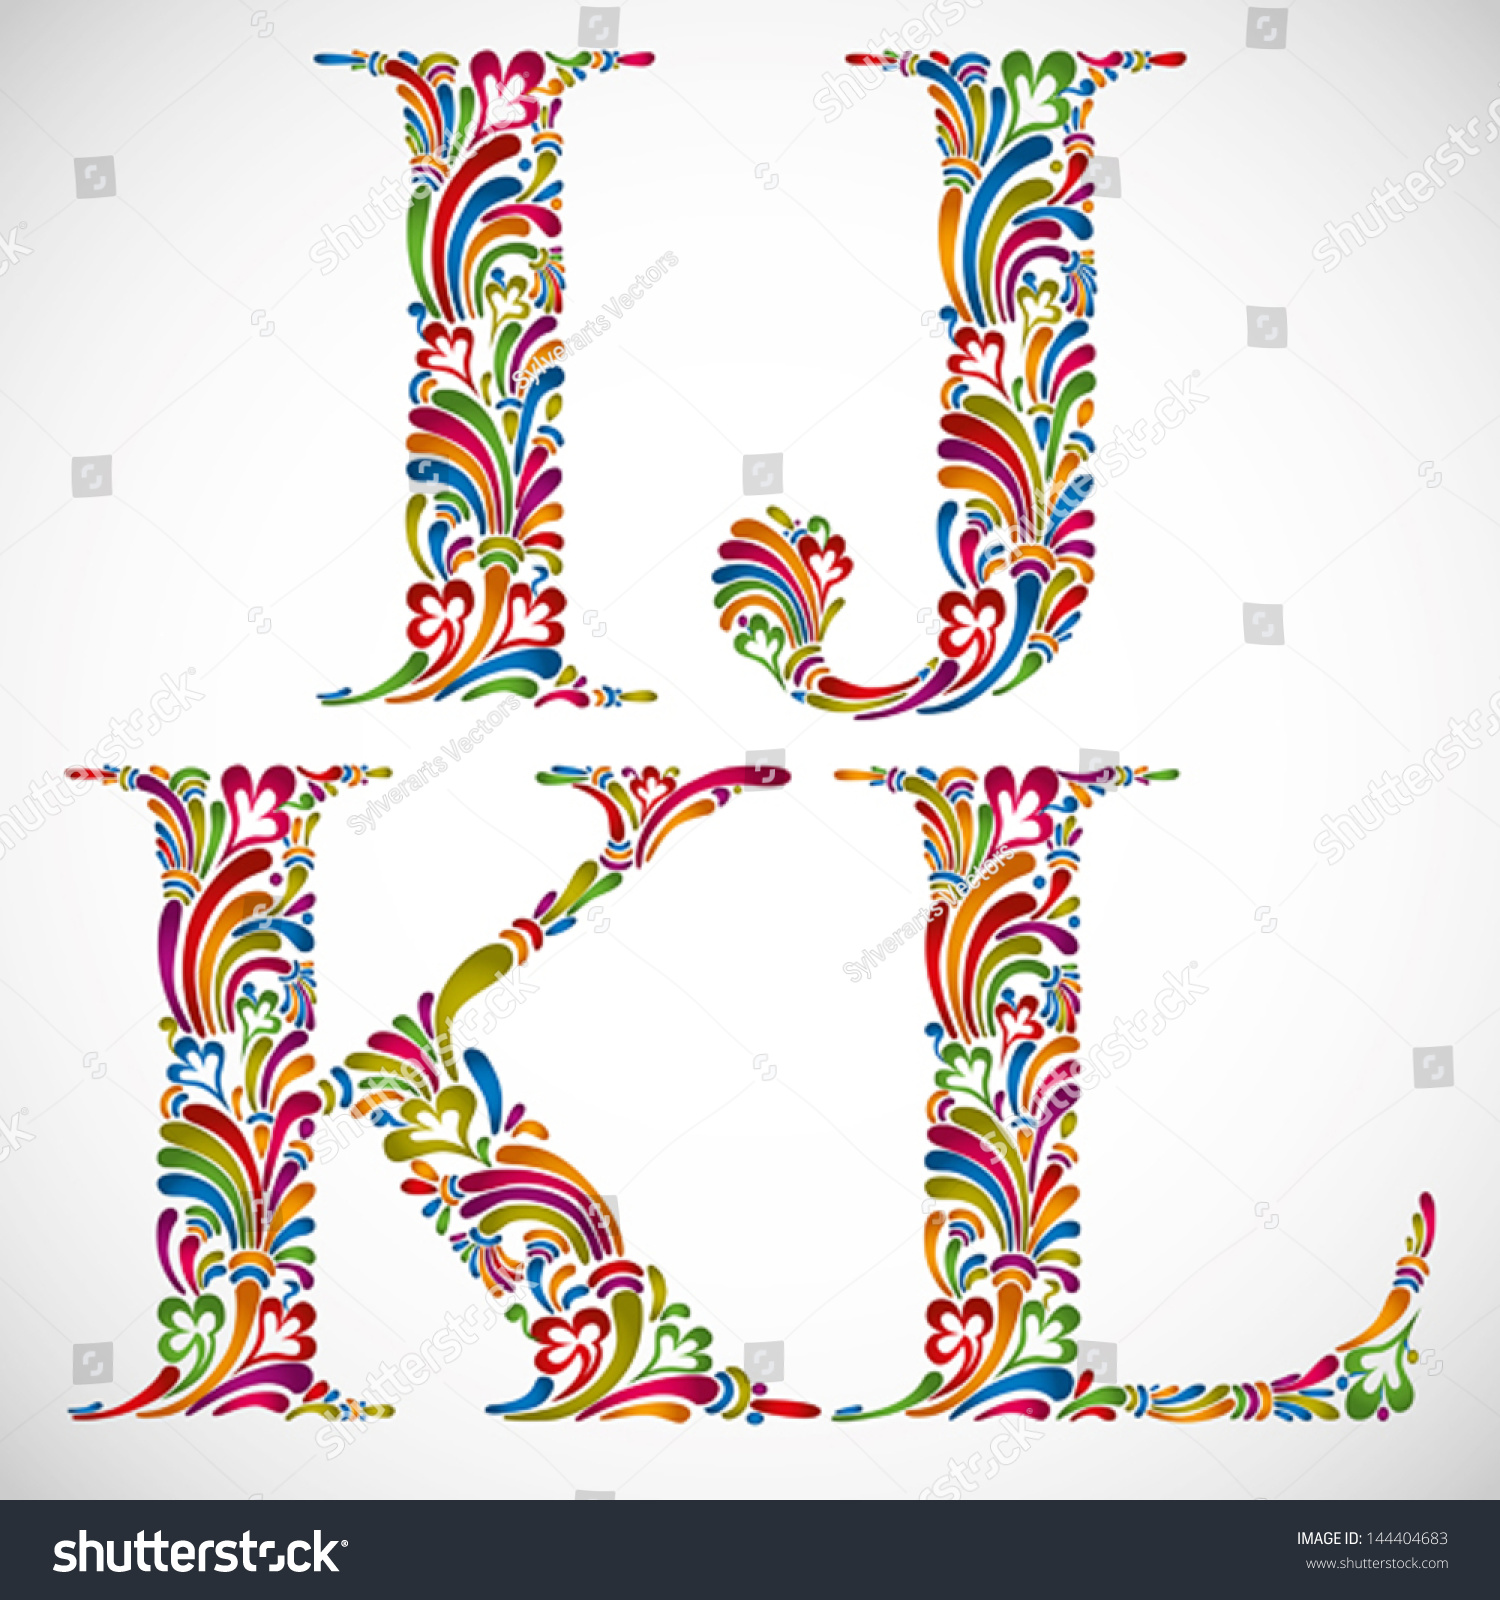 Colorful Floral Font Ornate Alphabet Letters Stock Vector